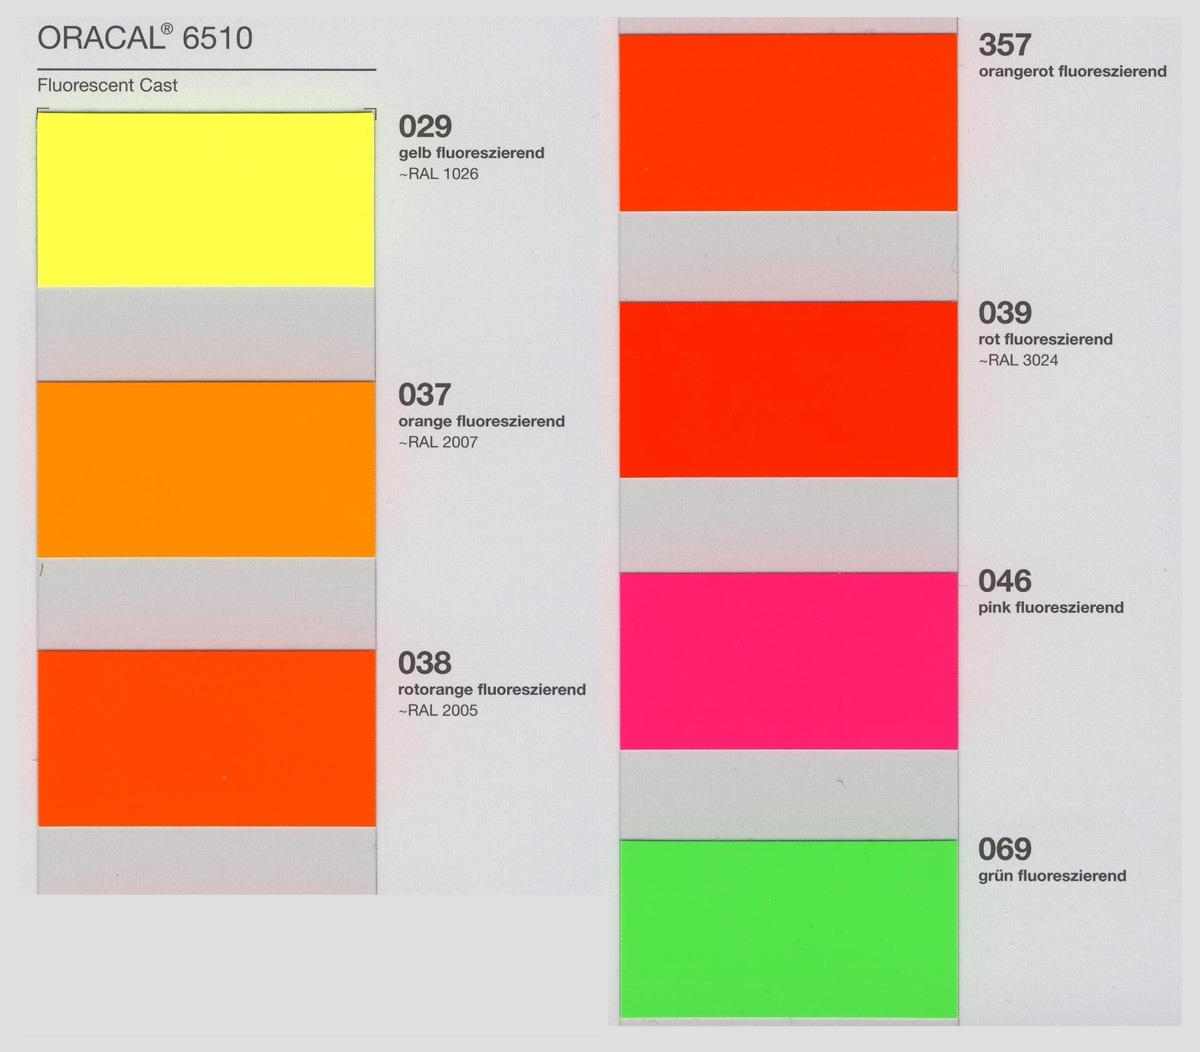 oracal 6510 colors - ORACAL 6510 Fluorescent Cast